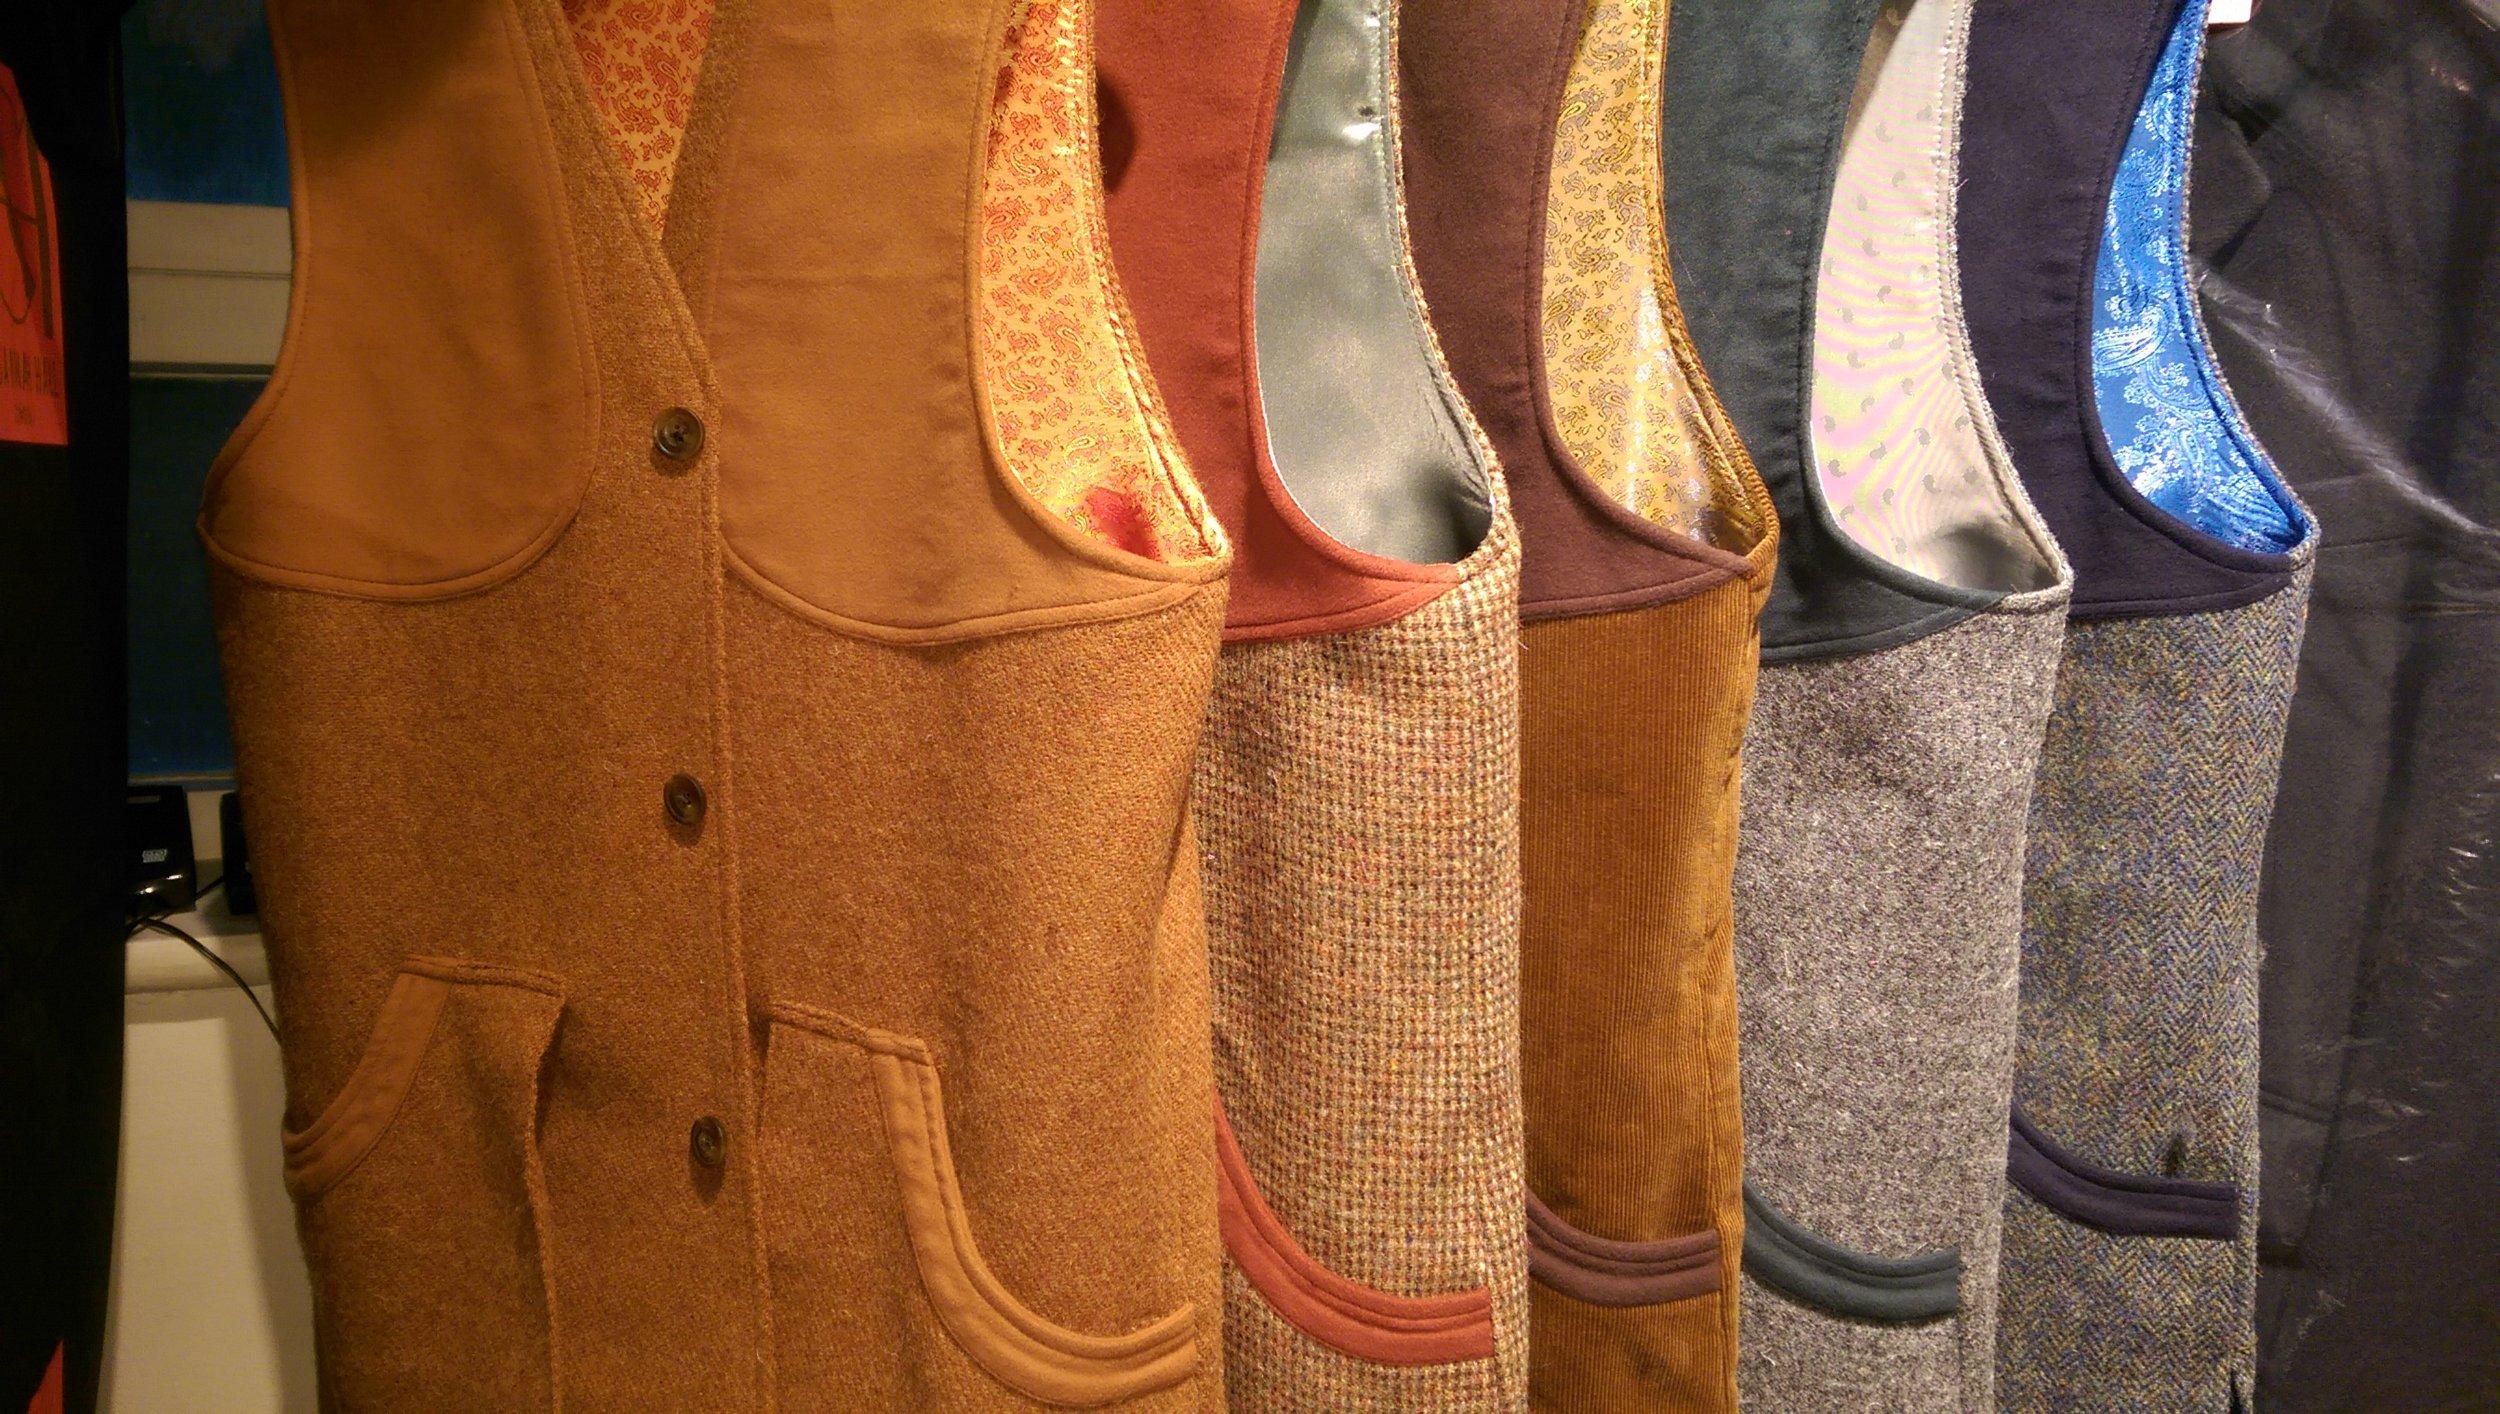 harris-tweed-moleskin-waistcoat-vest-bespoke-british-all-uk-made-tailoring-susannah-hall.jpg